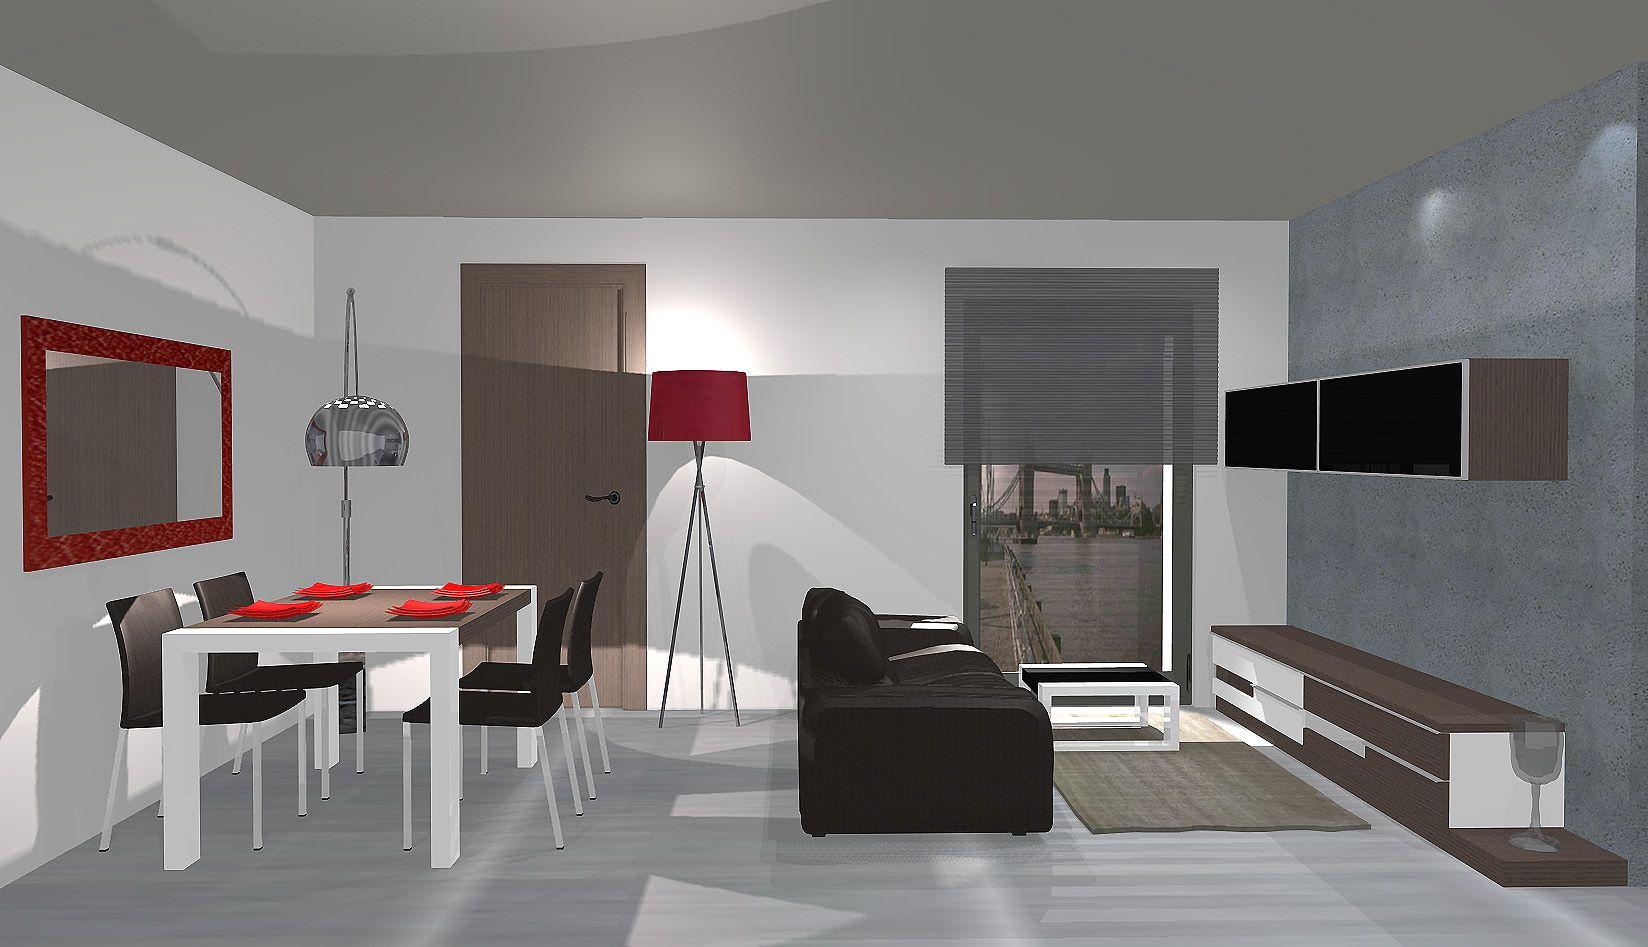 Decoracion #Moderno #Comedor #Sala de estar #Dibujos #Mesas de ...